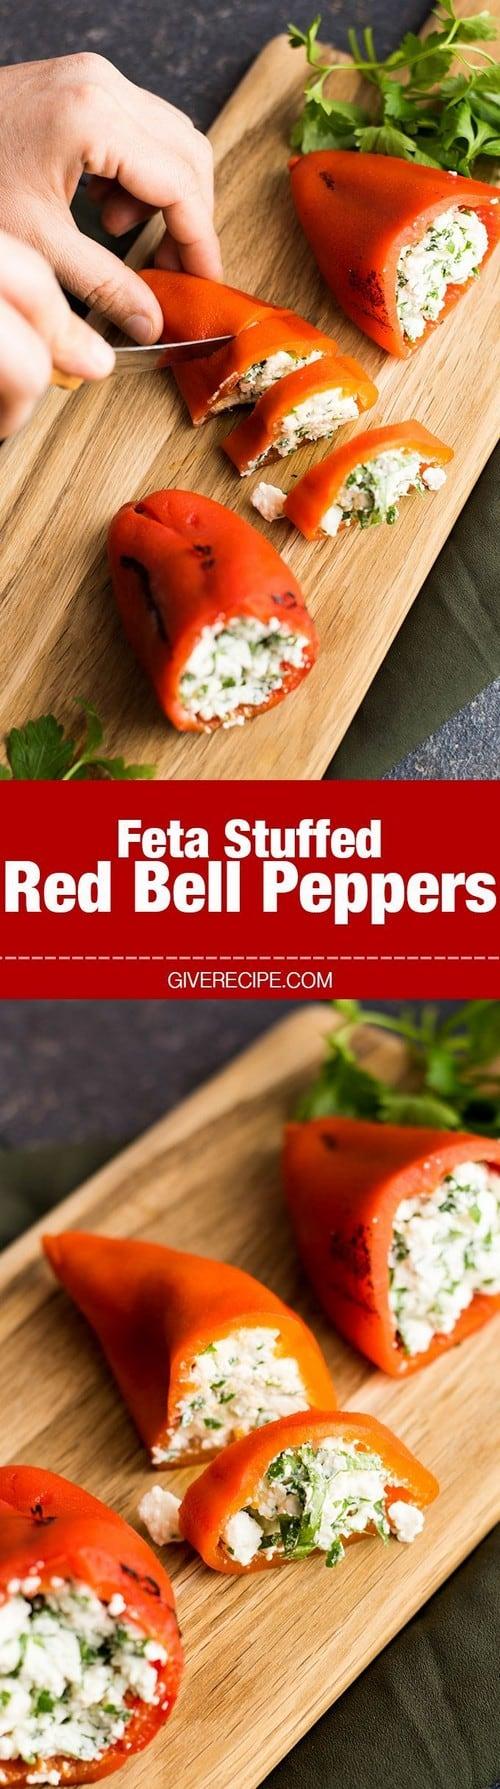 Mediterranean Feta Stuffed Red Bell Peppers